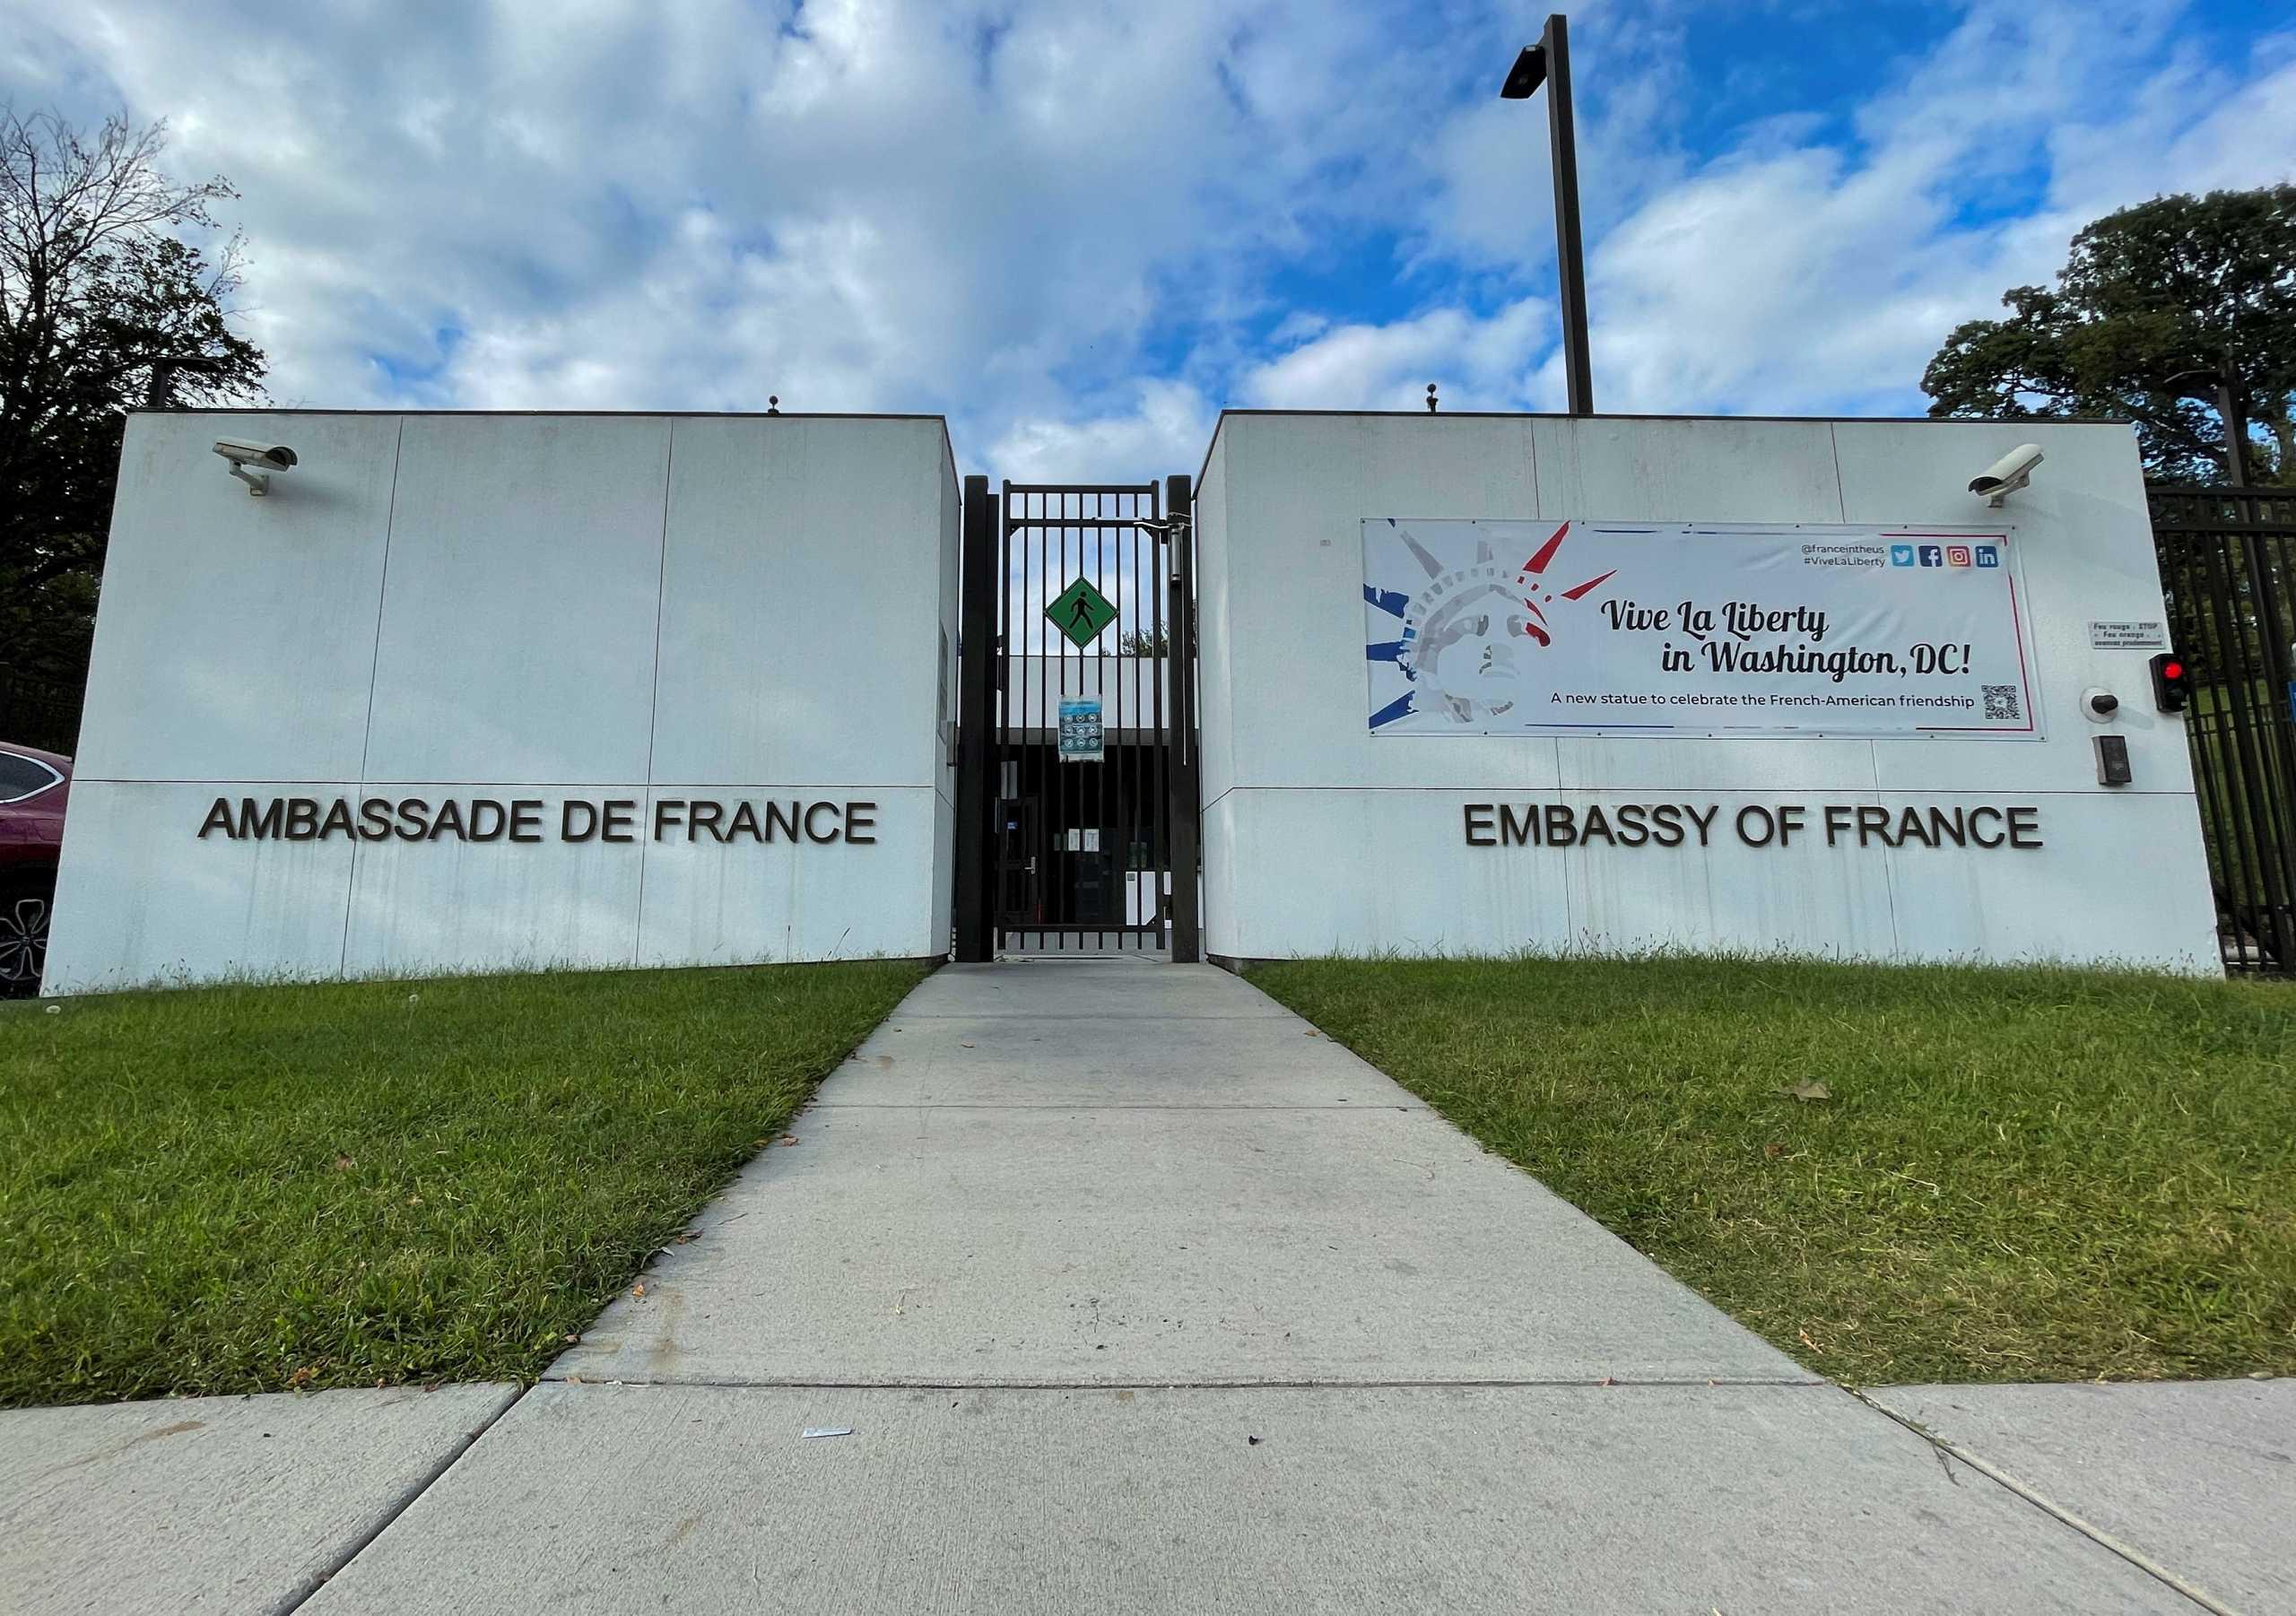 AUKUS – Γαλλία: Νέες αιχμές για την Αυστραλία – «Έκανε τεράστιο διπλωματικό λάθος»